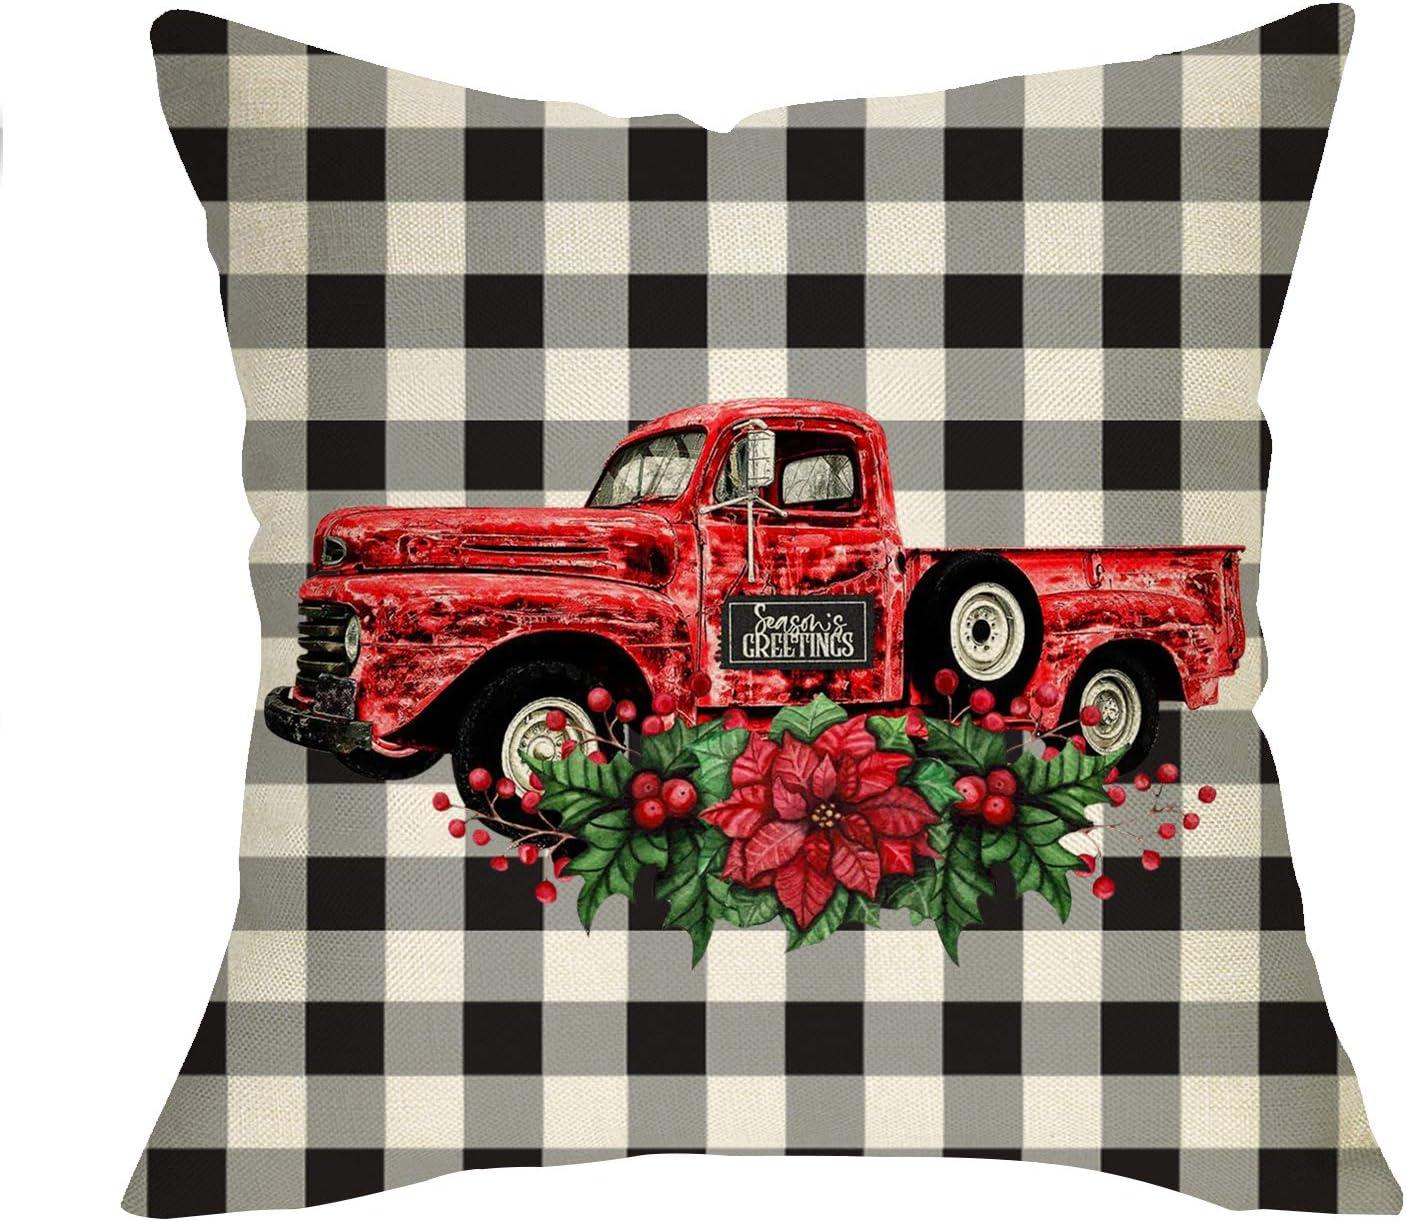 Seasonal Home Decor 18 x 18 Buffalo Check Plaid Vintage Red Truck Christmas Pillow Cover- Farm Fresh Christmas Pillow Throw Pillow